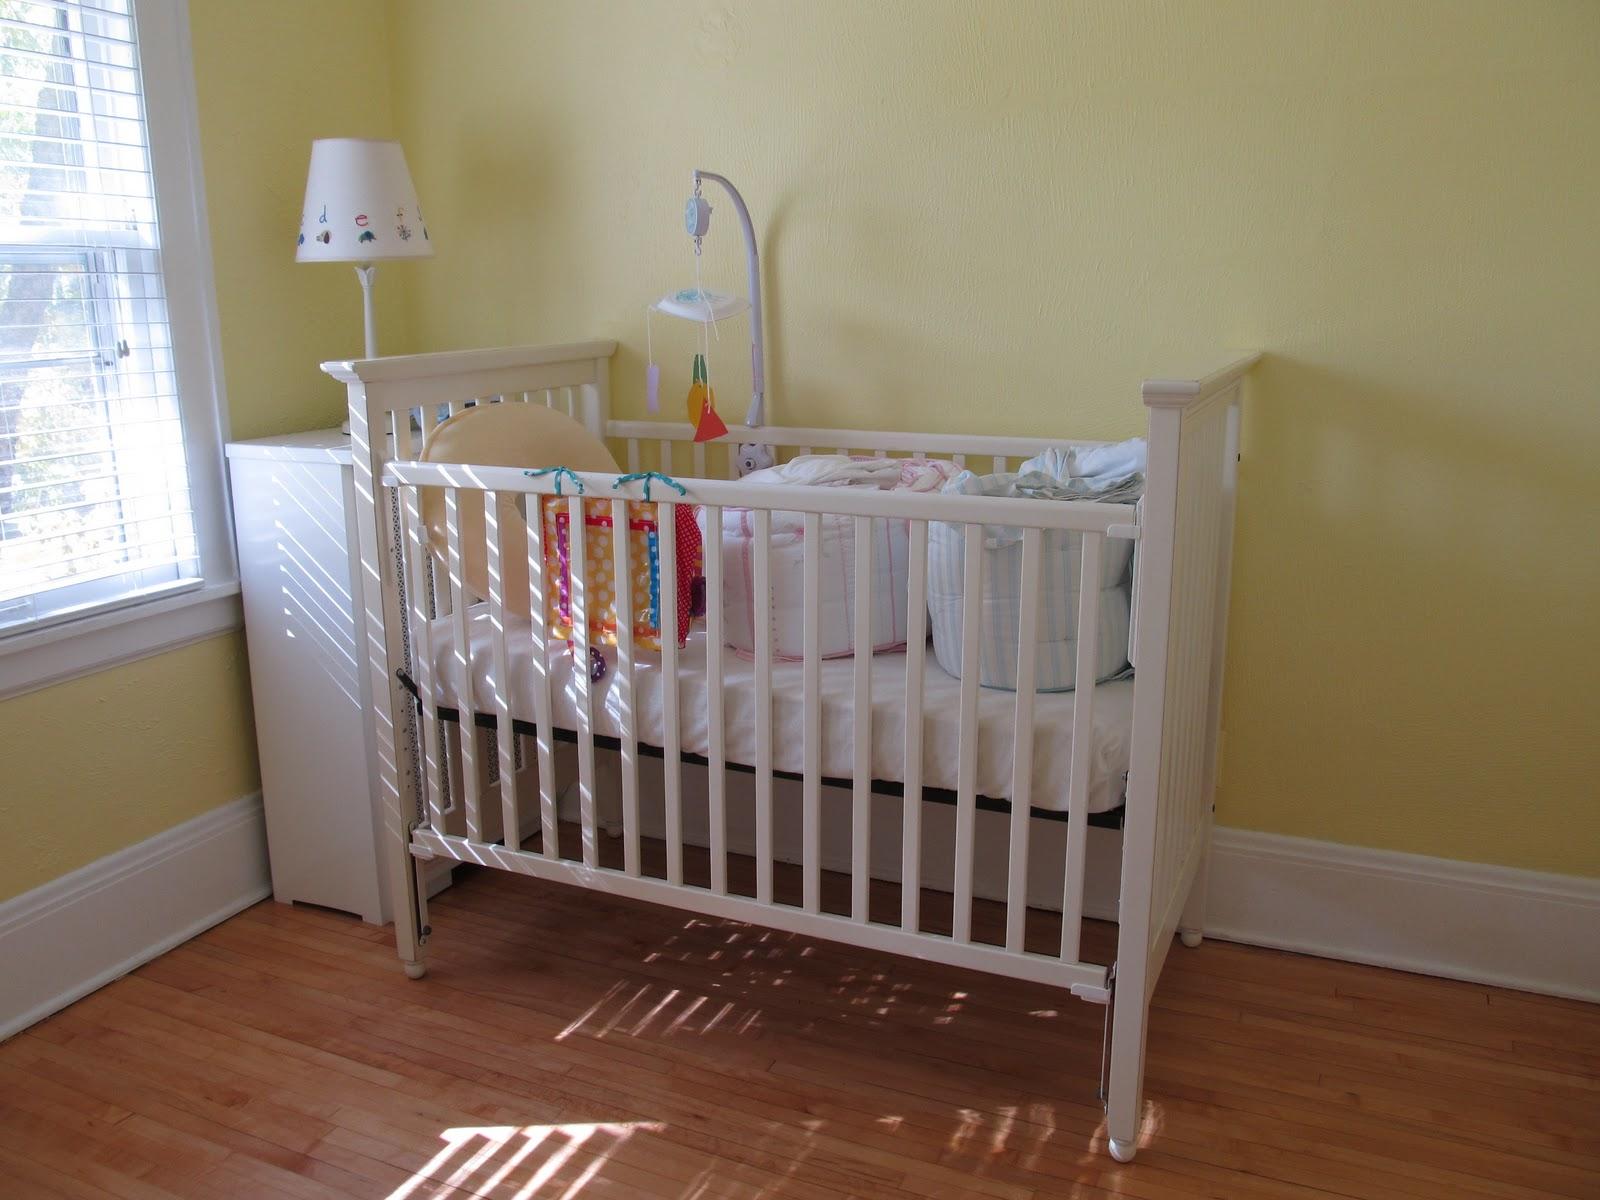 Baby bed for 2 year old - Baby Bed For 2 Year Old 47